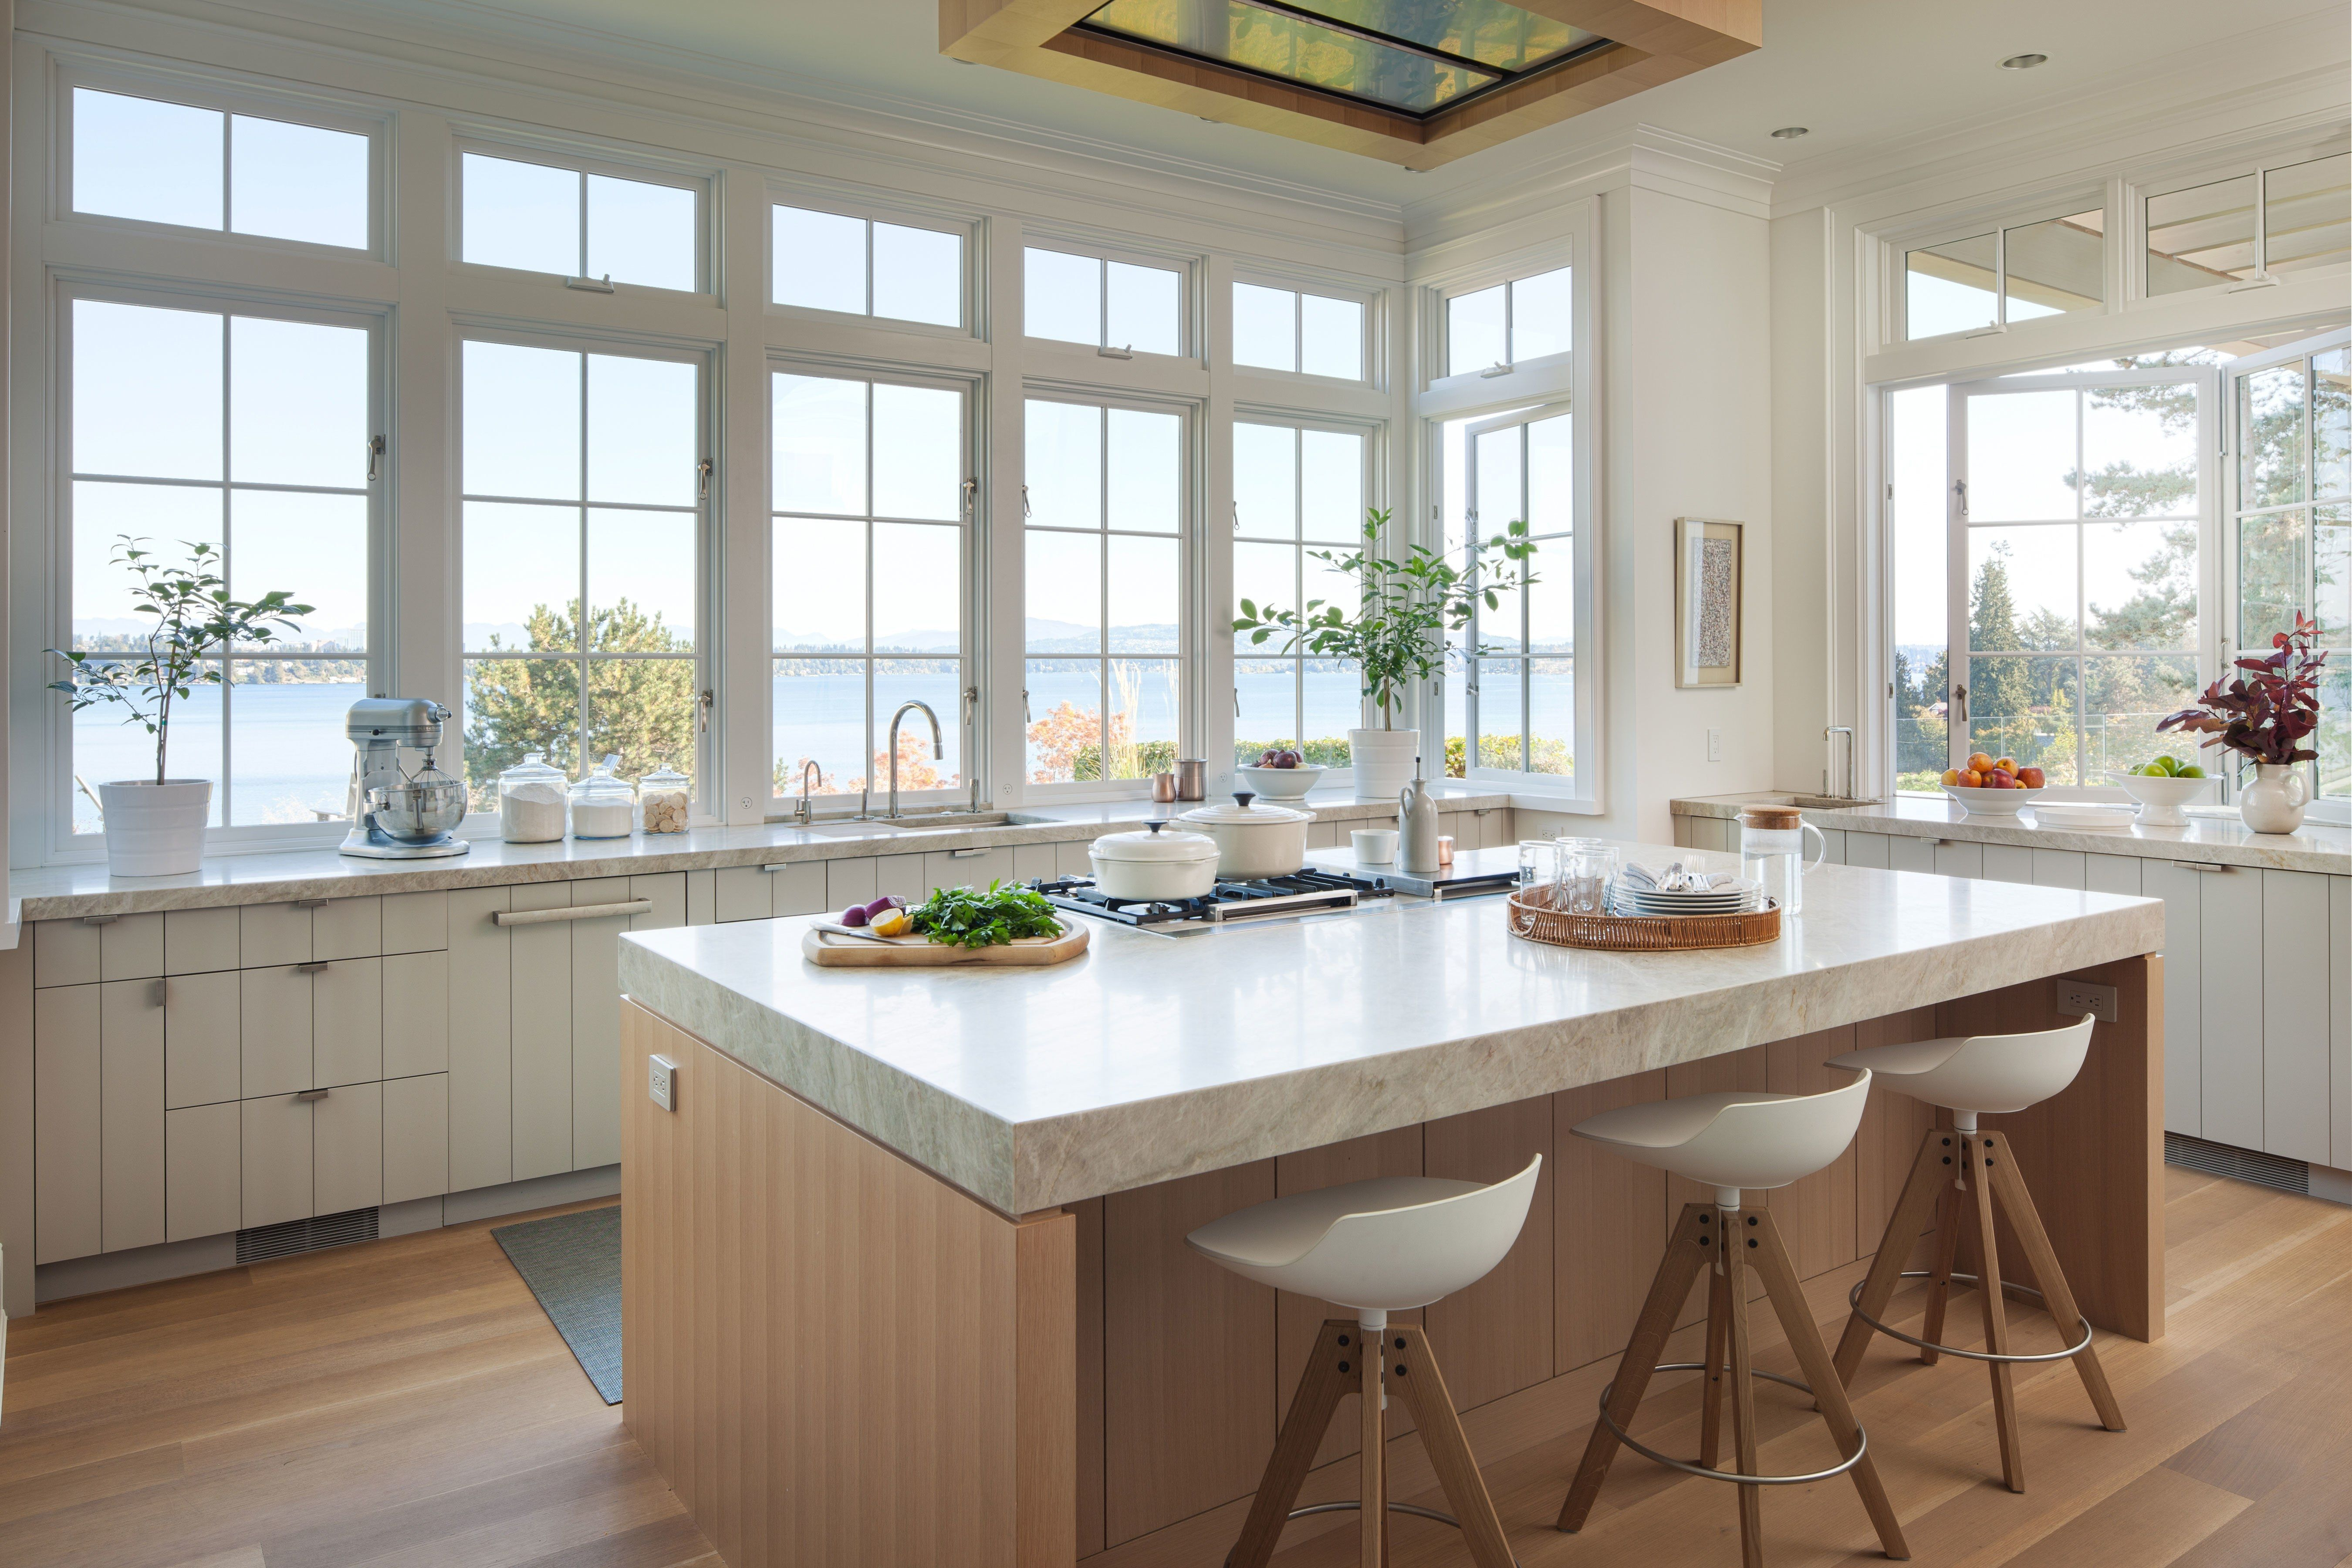 20 Best Kitchen Countertops Design Ideas People Are Doing Right Now Kitchen Window Design Modern Georgian Home Decor Kitchen